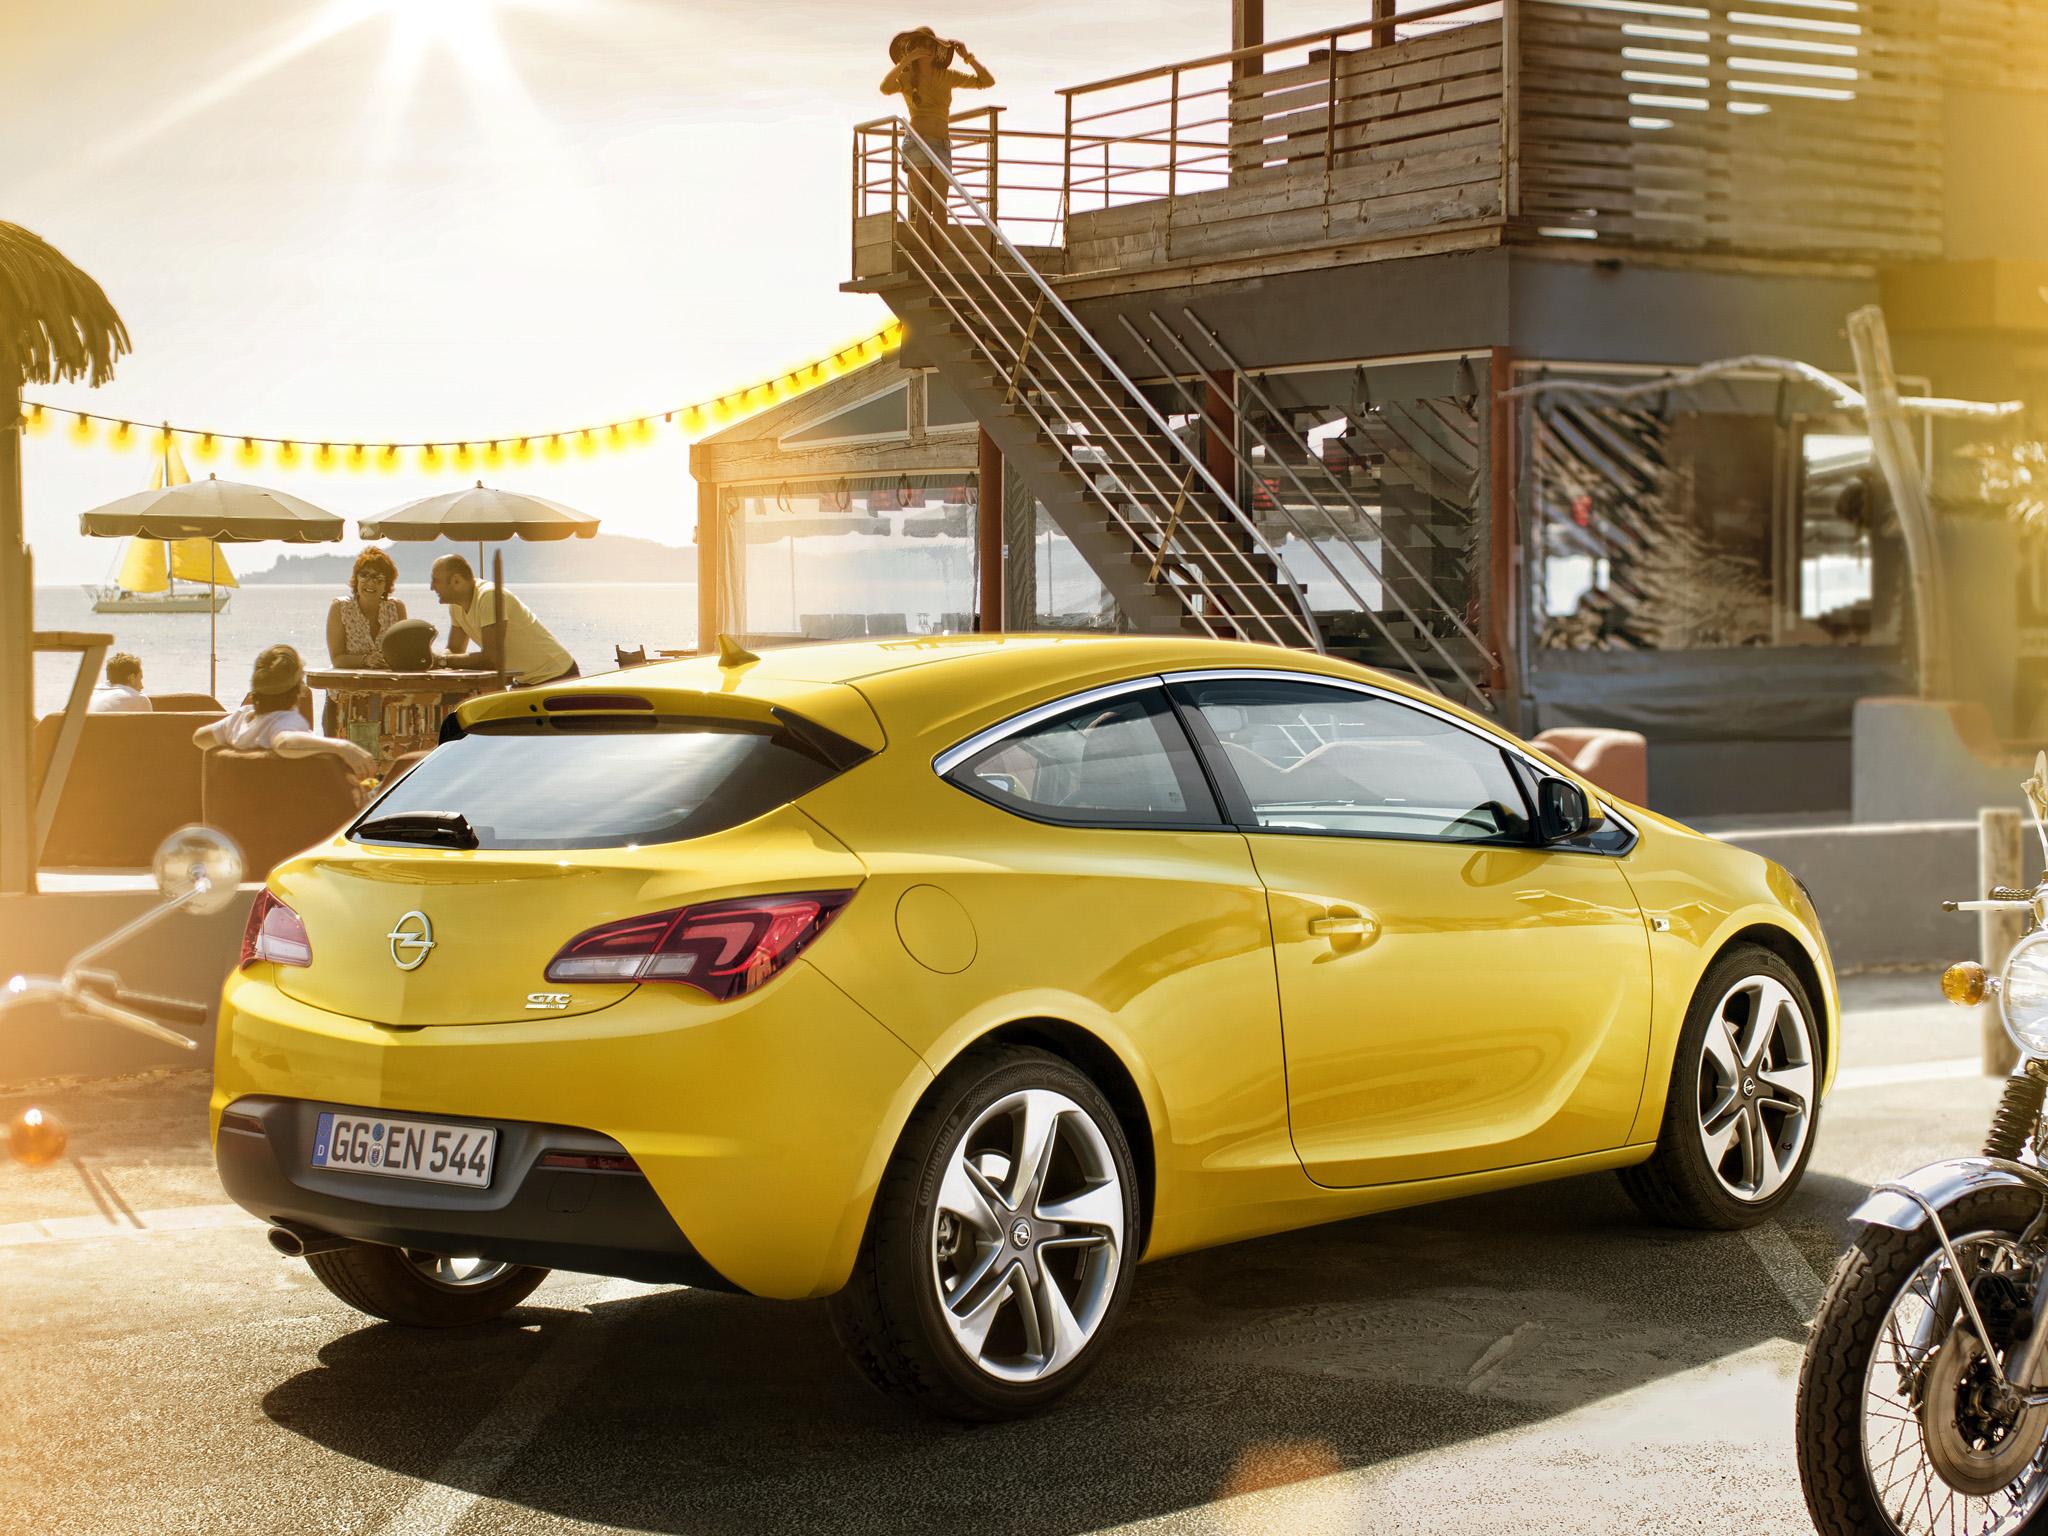 Объем топливного бака Opel Astra J GTC